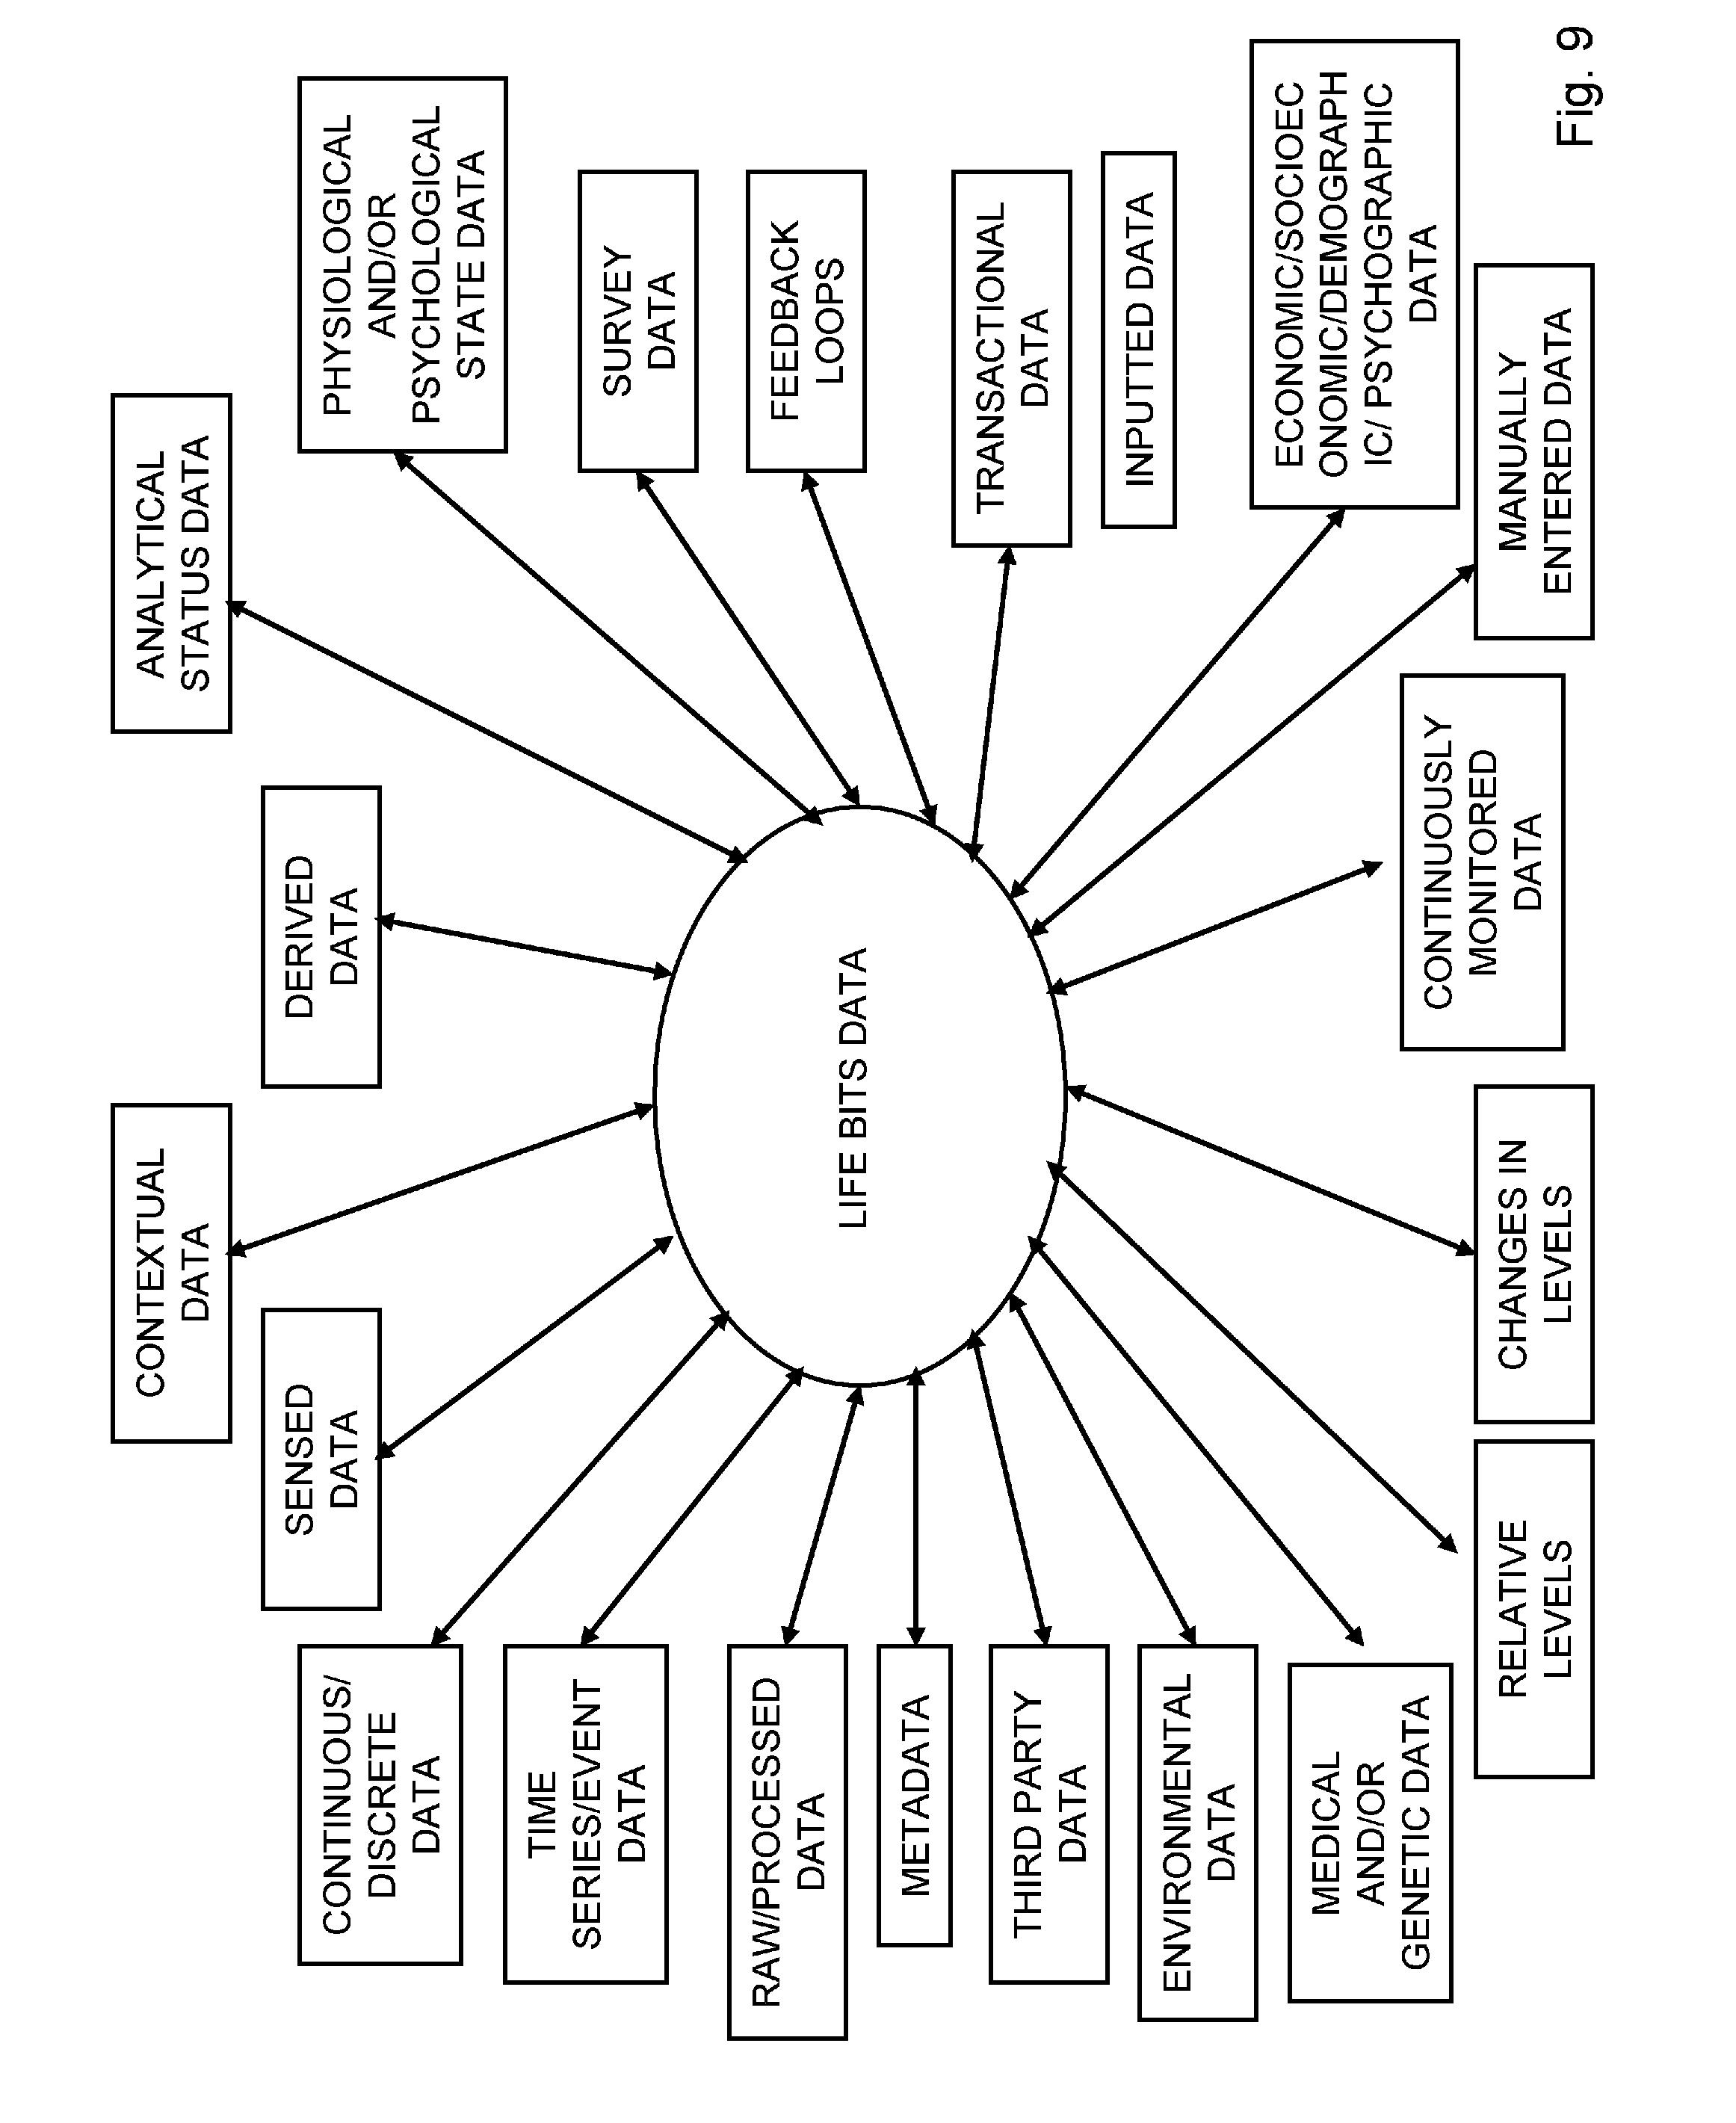 patent us 8 382 590 b2 Fire Alarm Symbols Legend patent